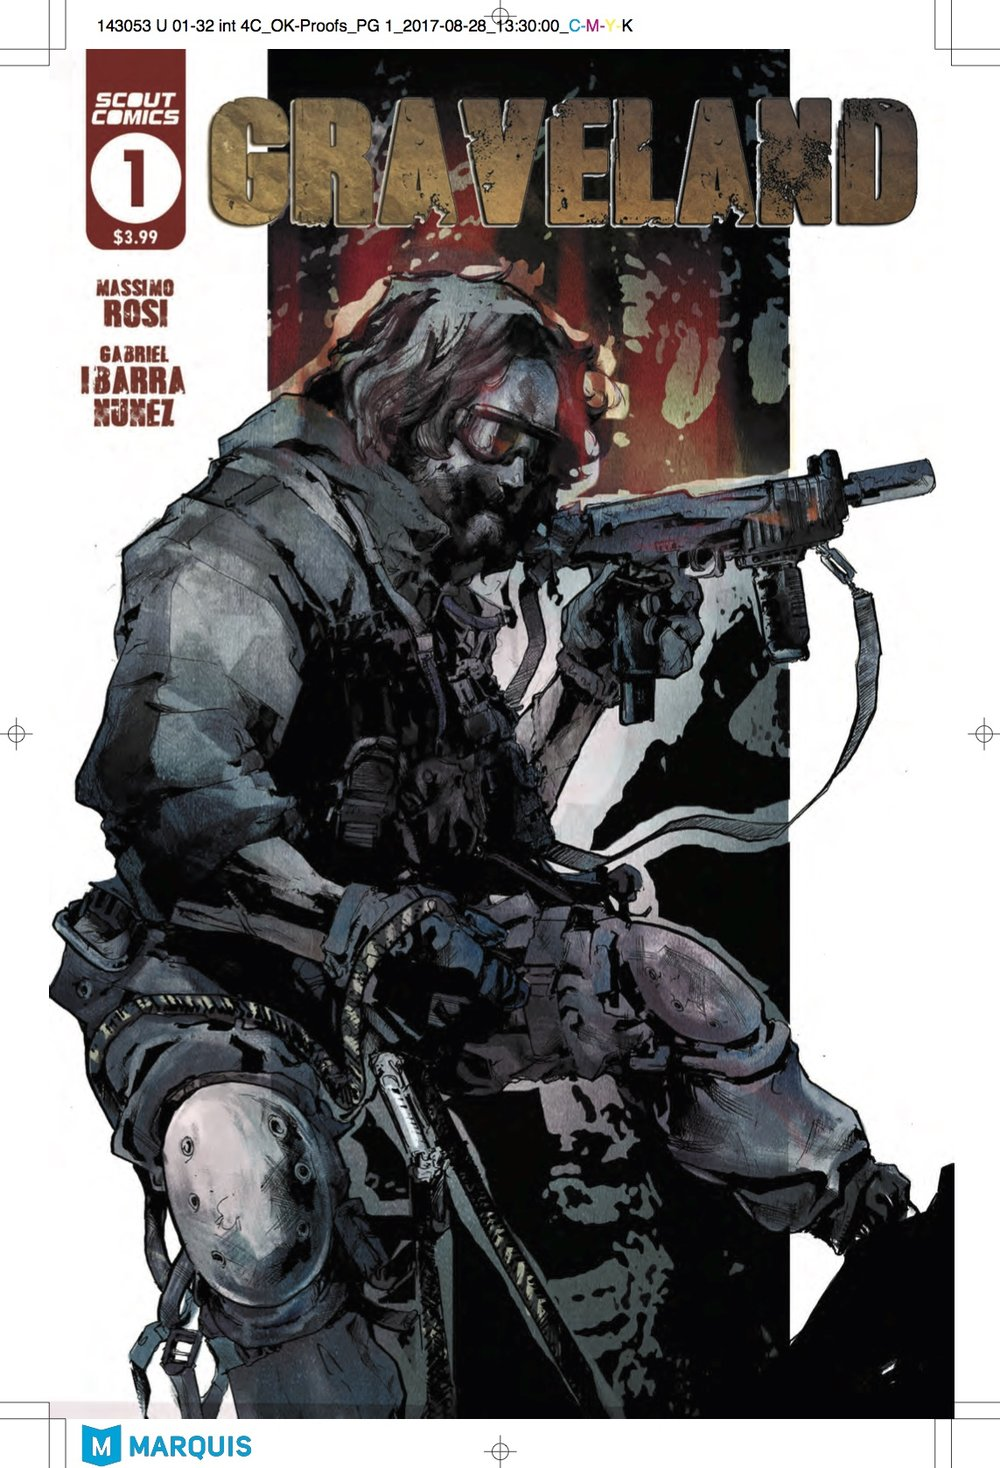 Comic Review Photo - Graveland #1.jpg